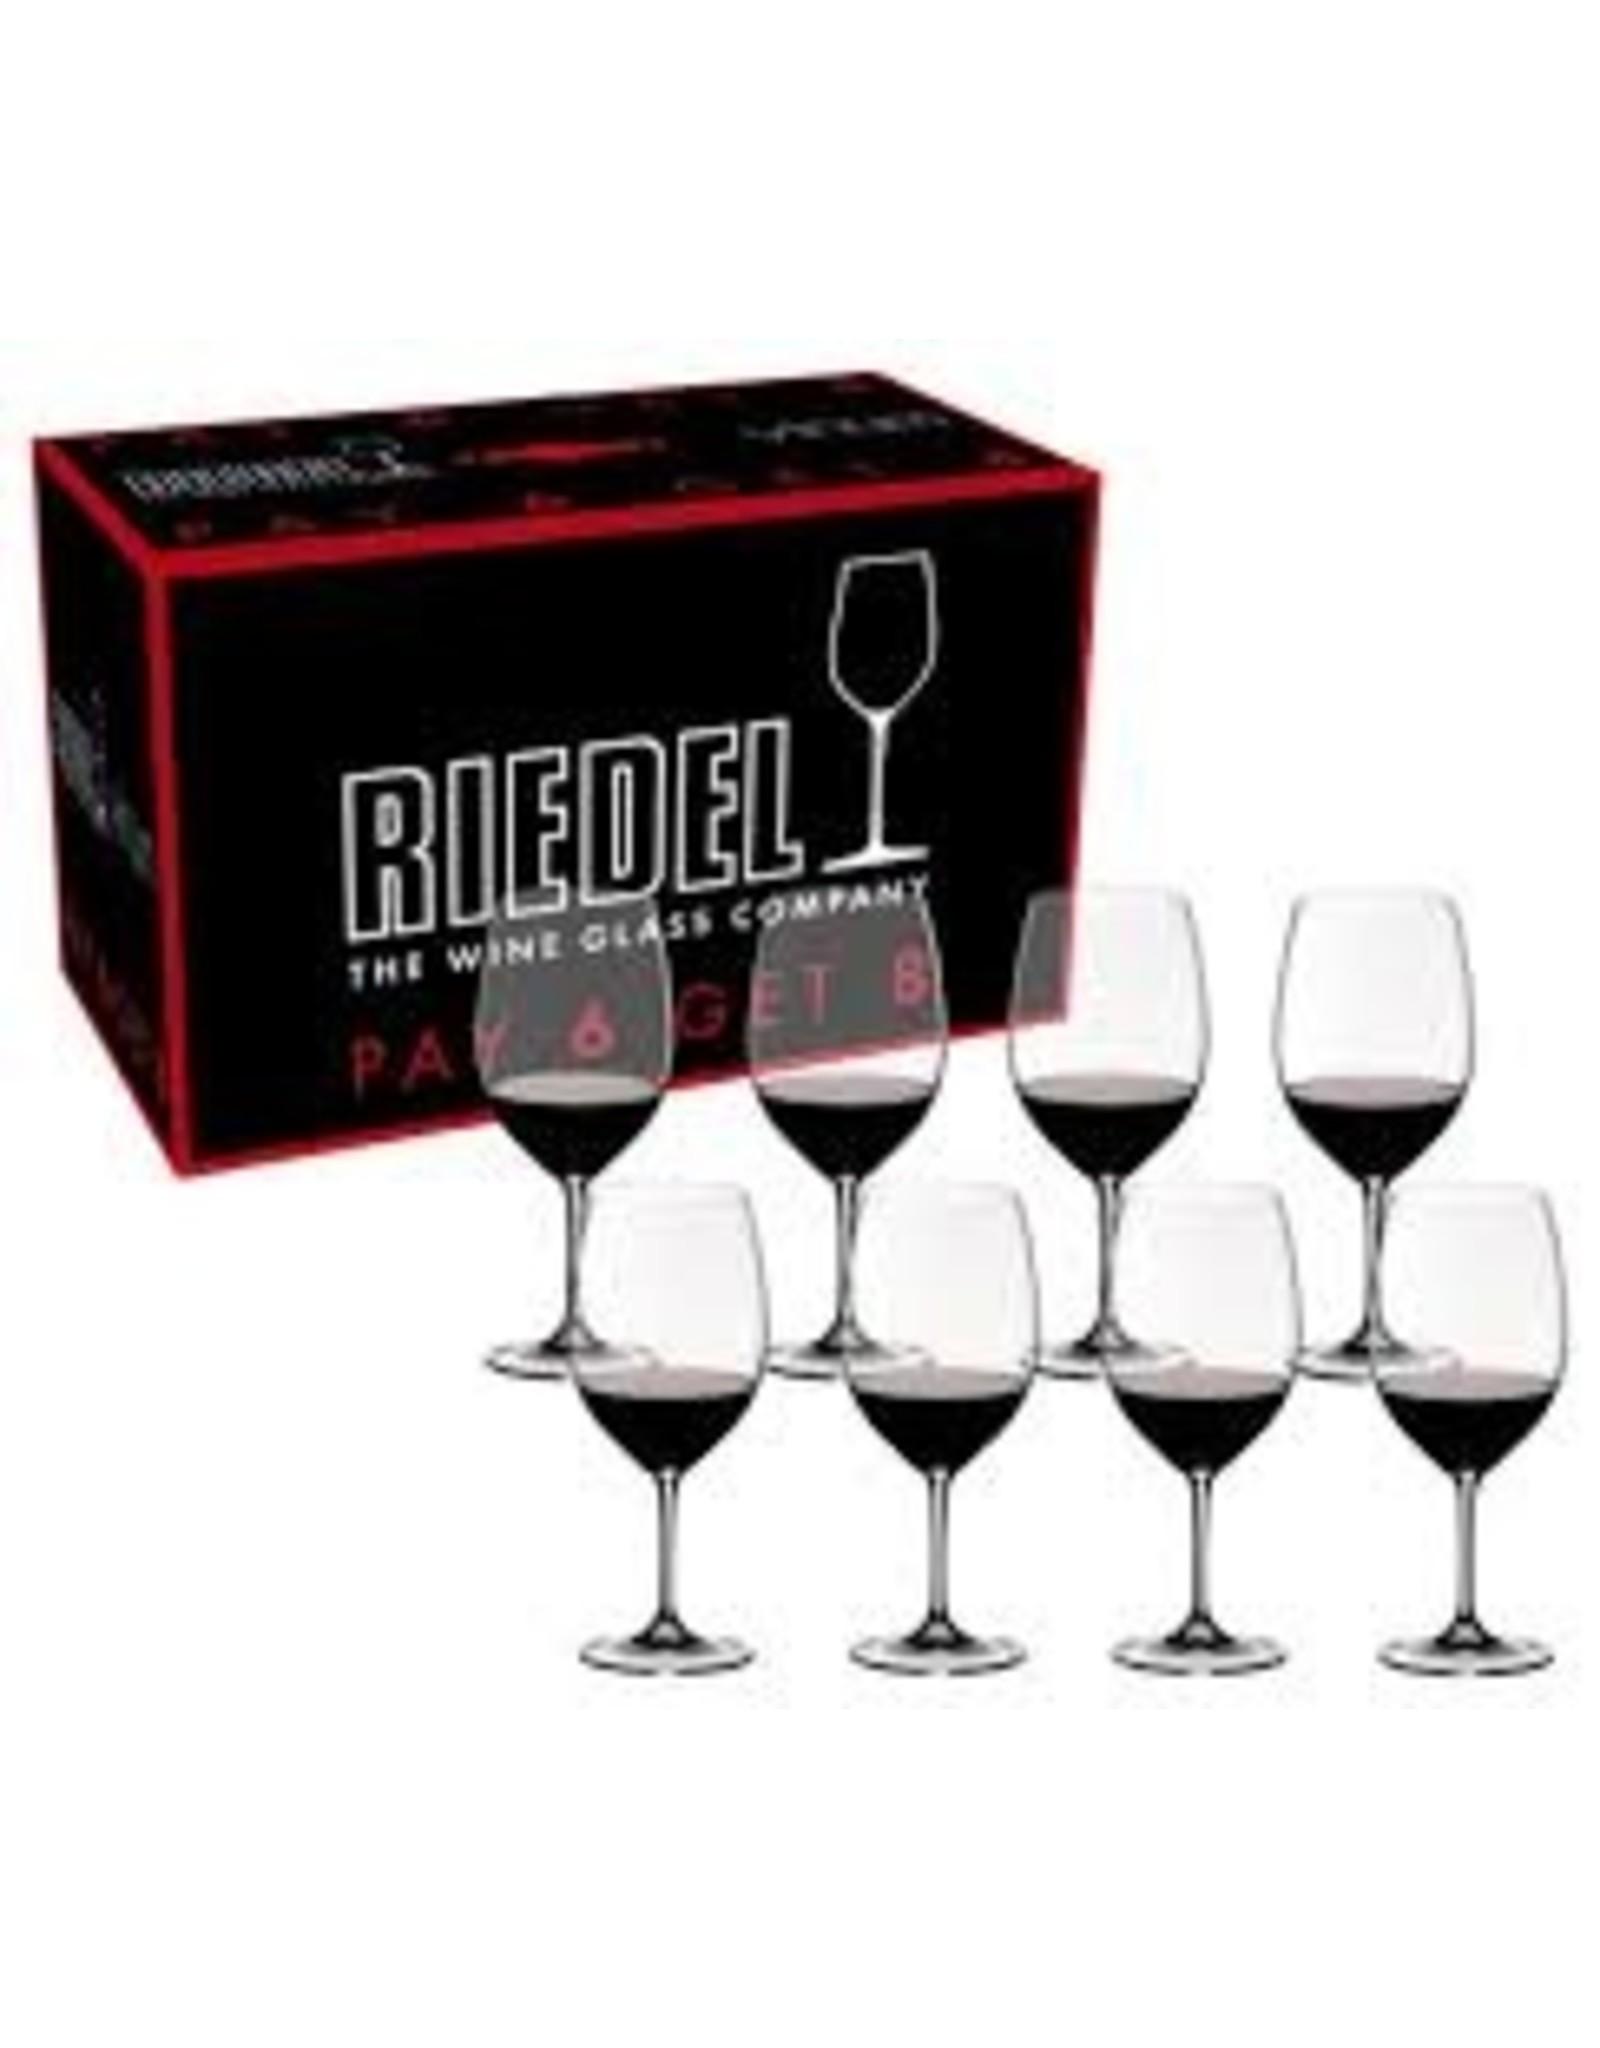 Riedel RIEDEL Bordeaux Buy 6 Get 8